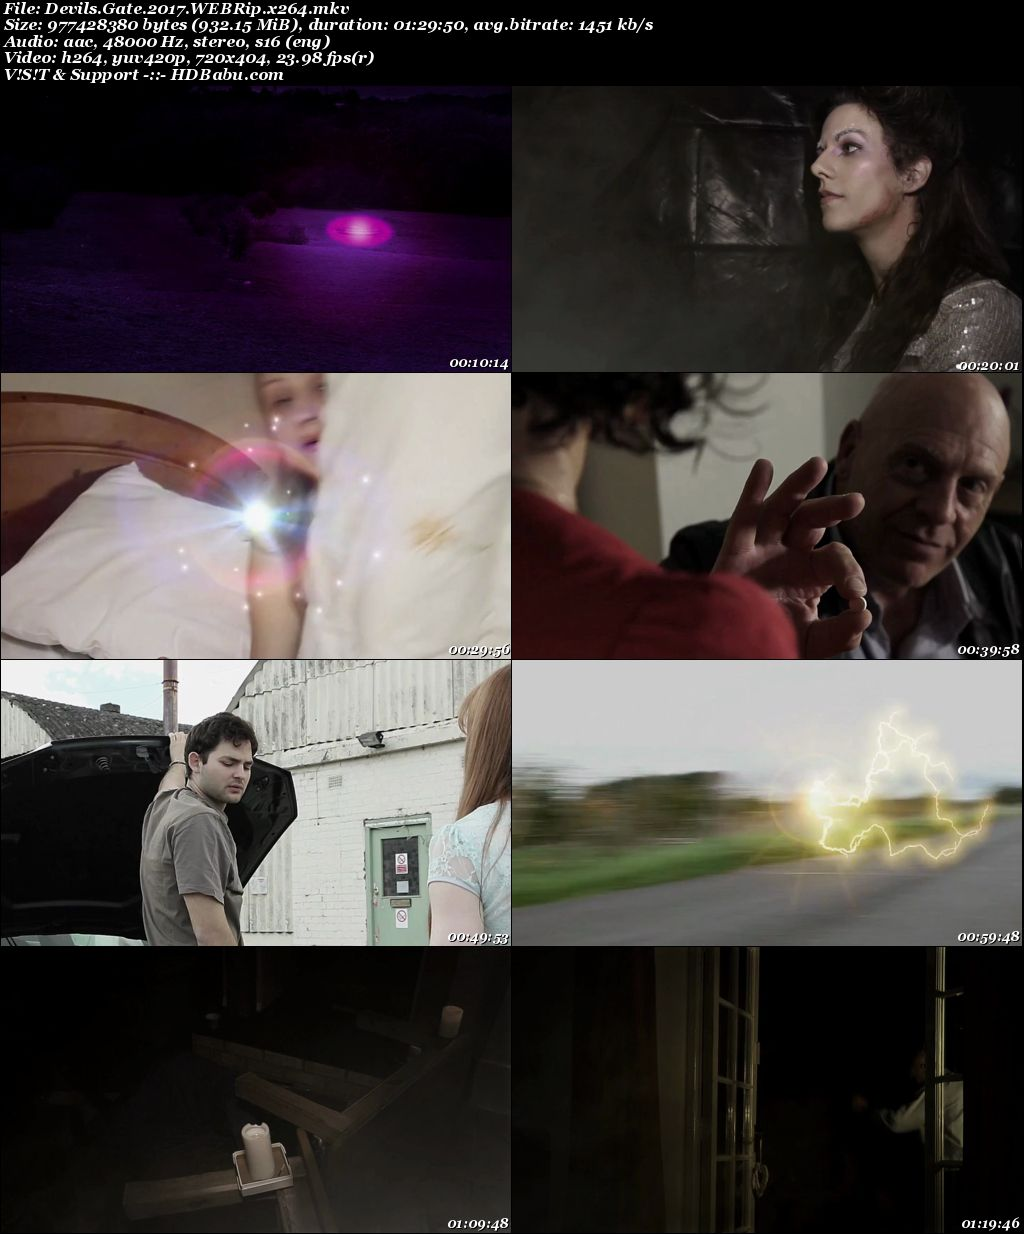 Devil's Gate Full Movie Download 720p English HD